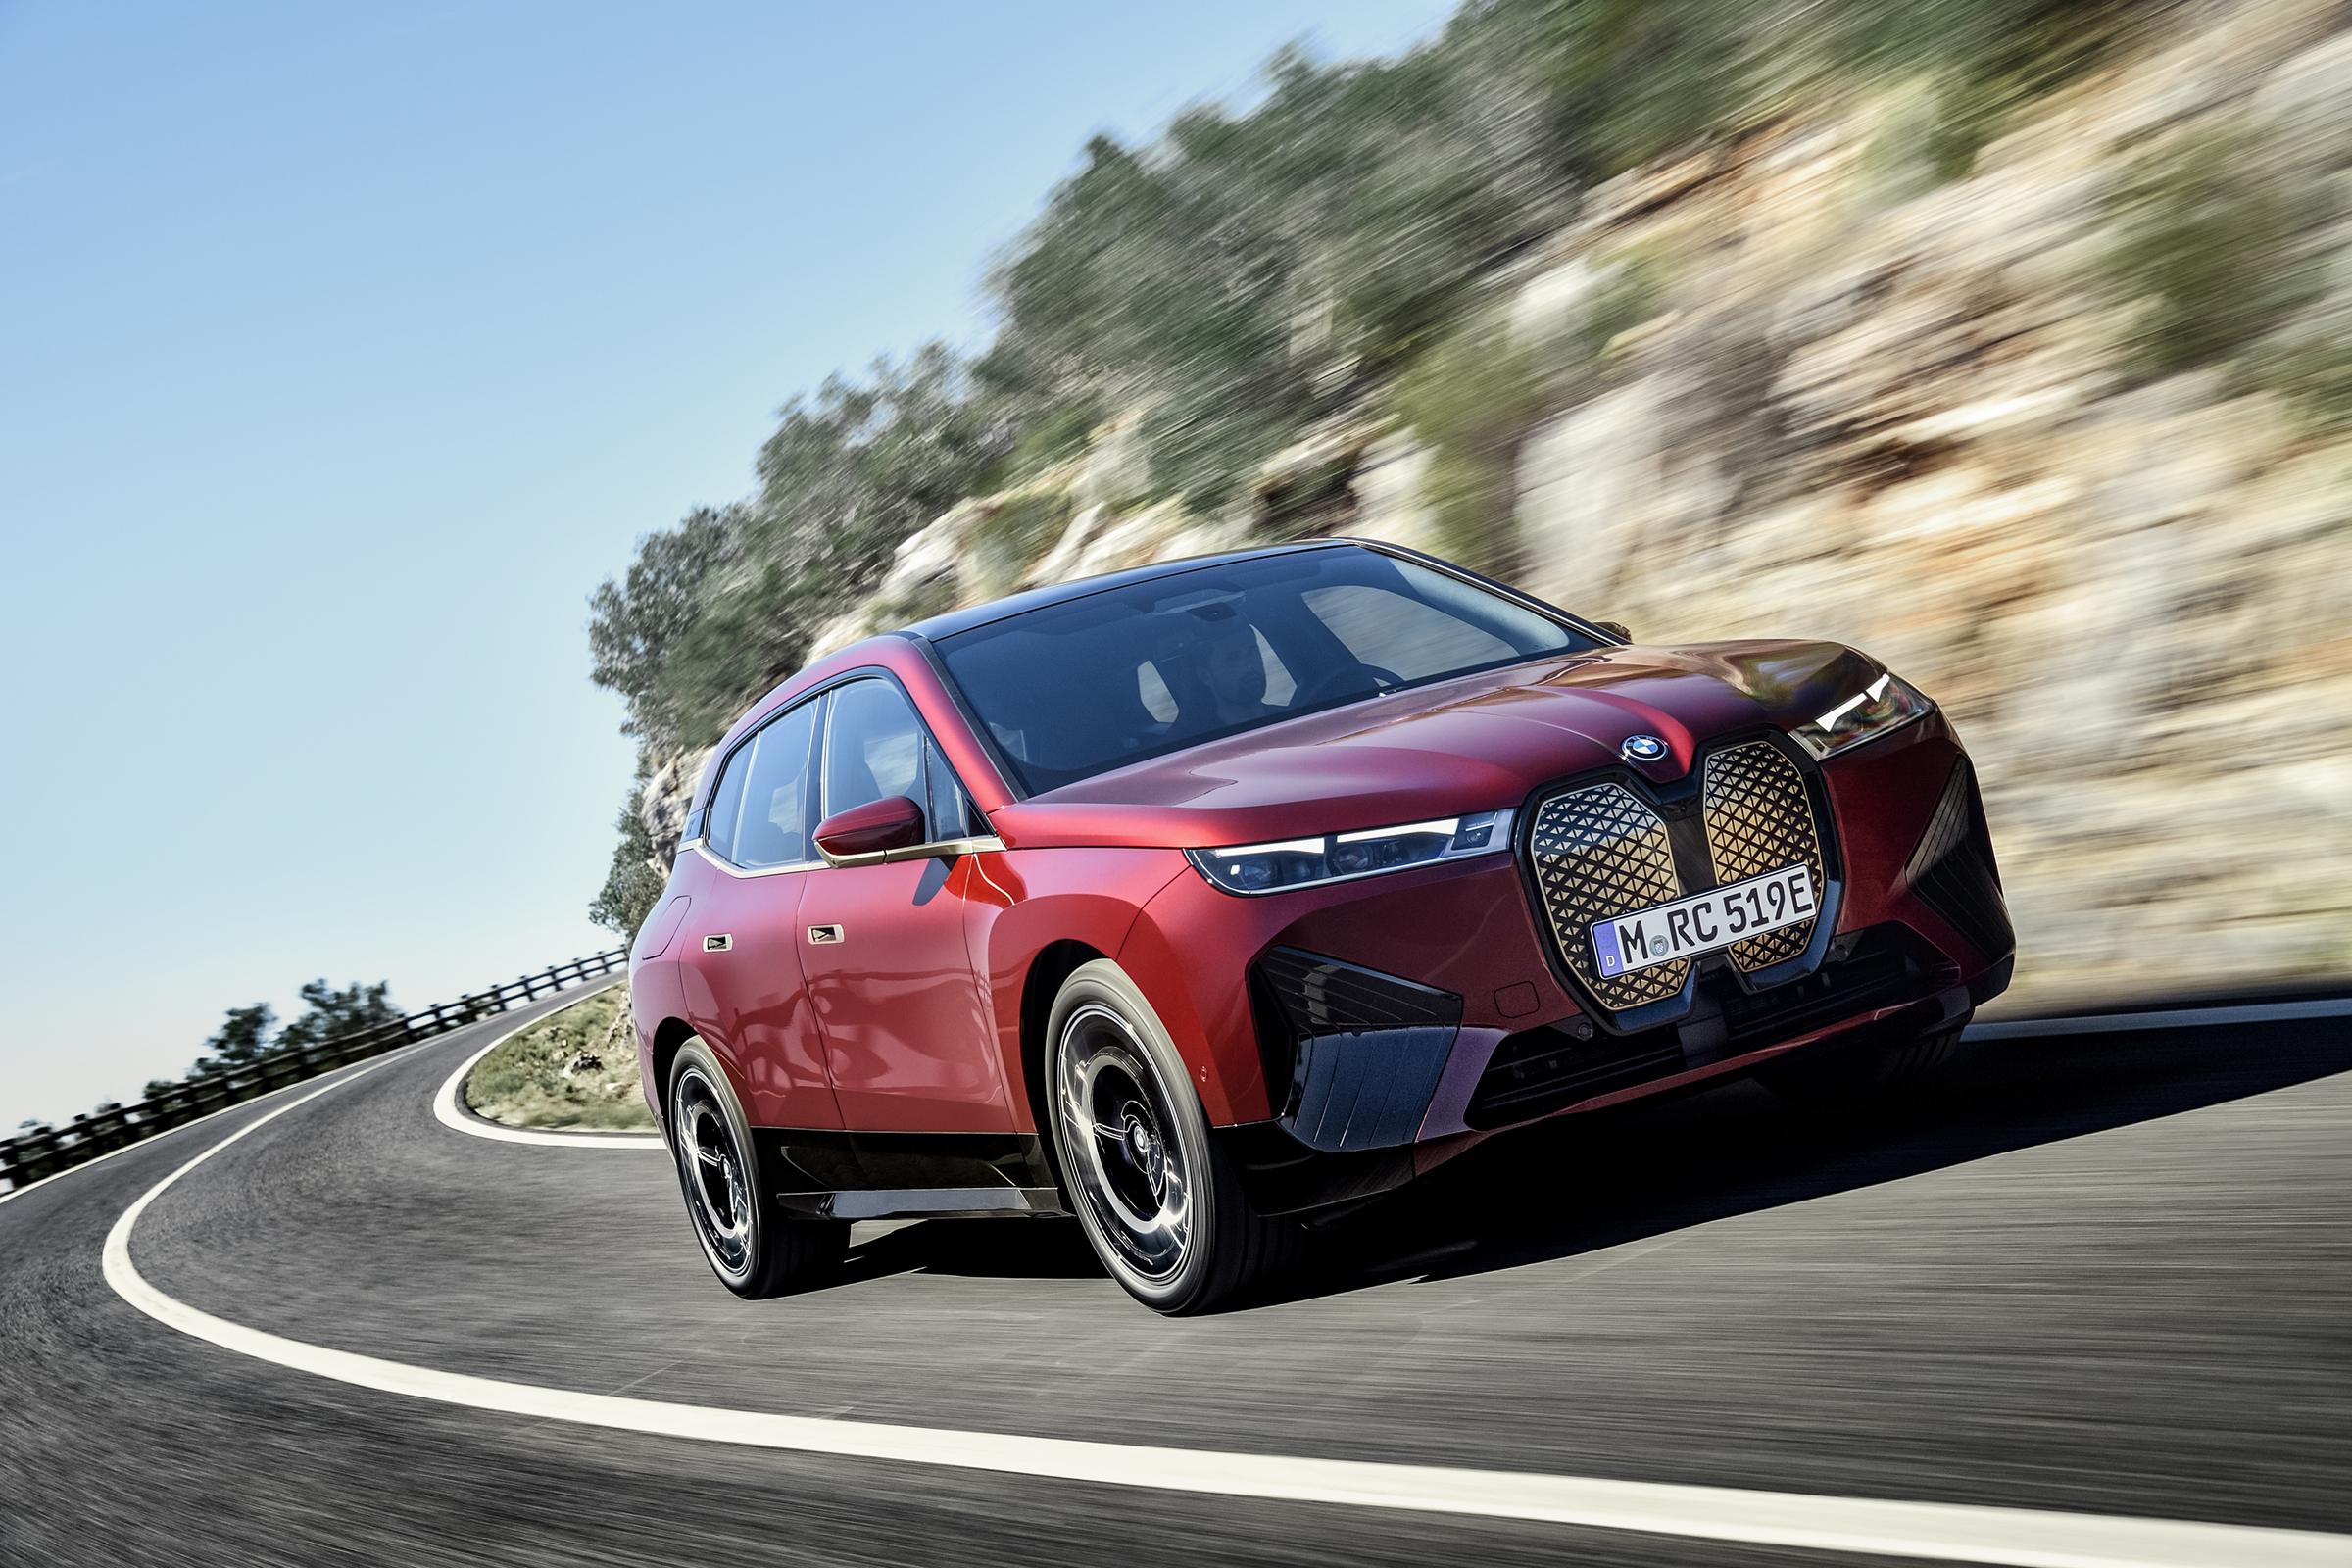 BMW Electric car driving